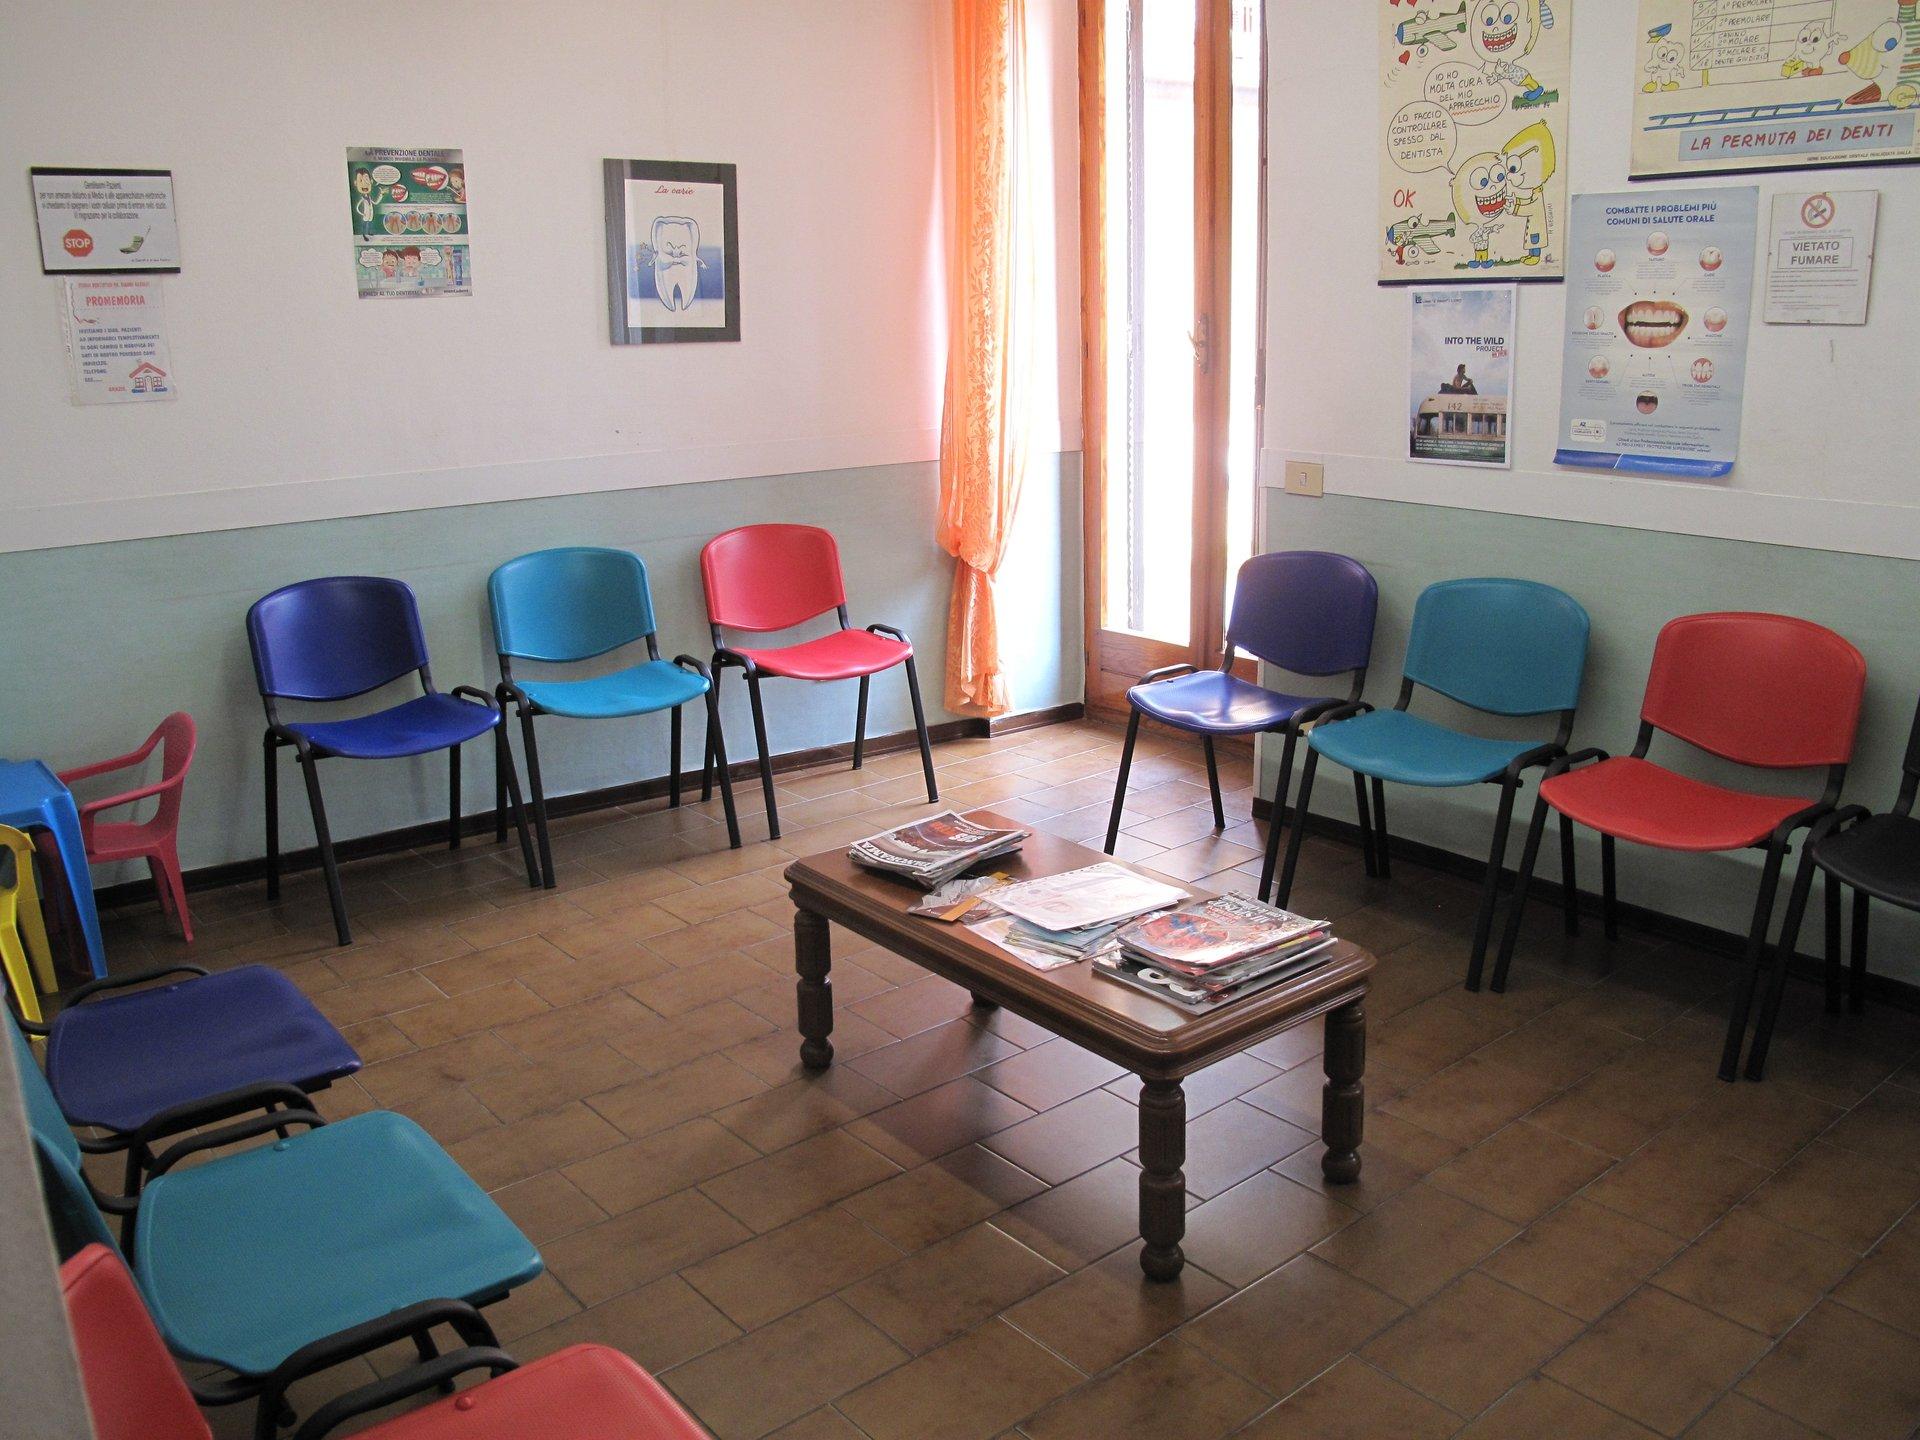 sala d'attesa con sedie colorate